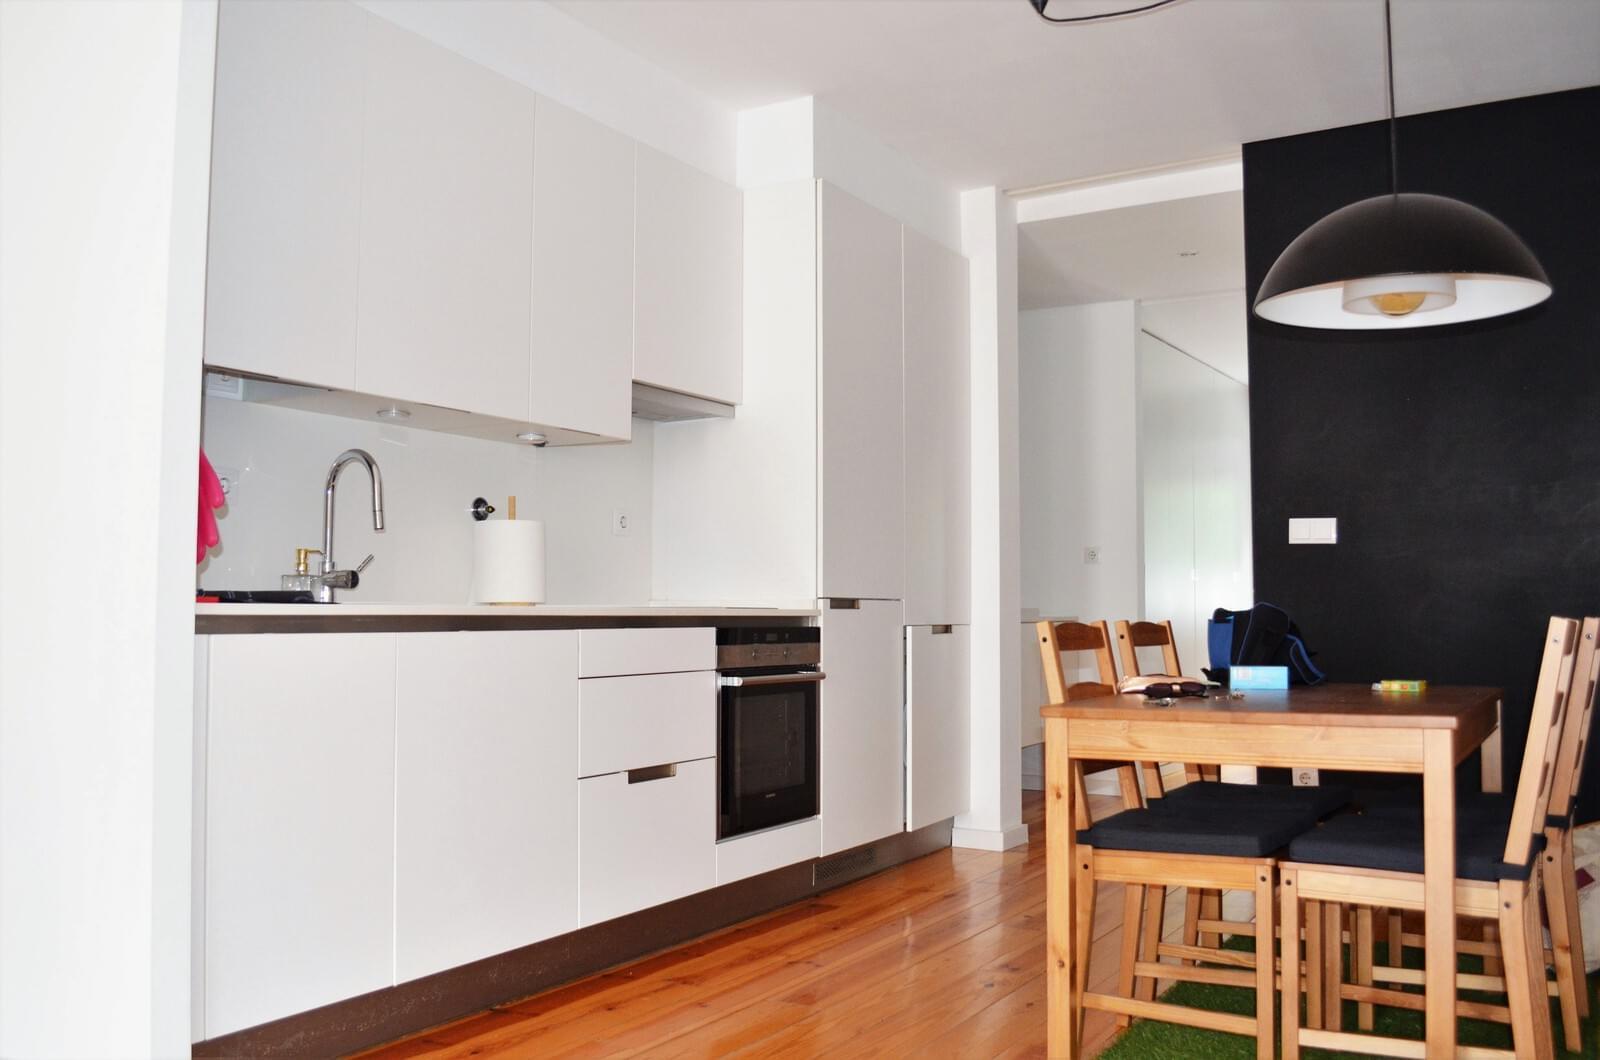 pf17785-apartamento-t1-lisboa-93c8a76b-e5c9-40fb-bd27-5a453510ab95